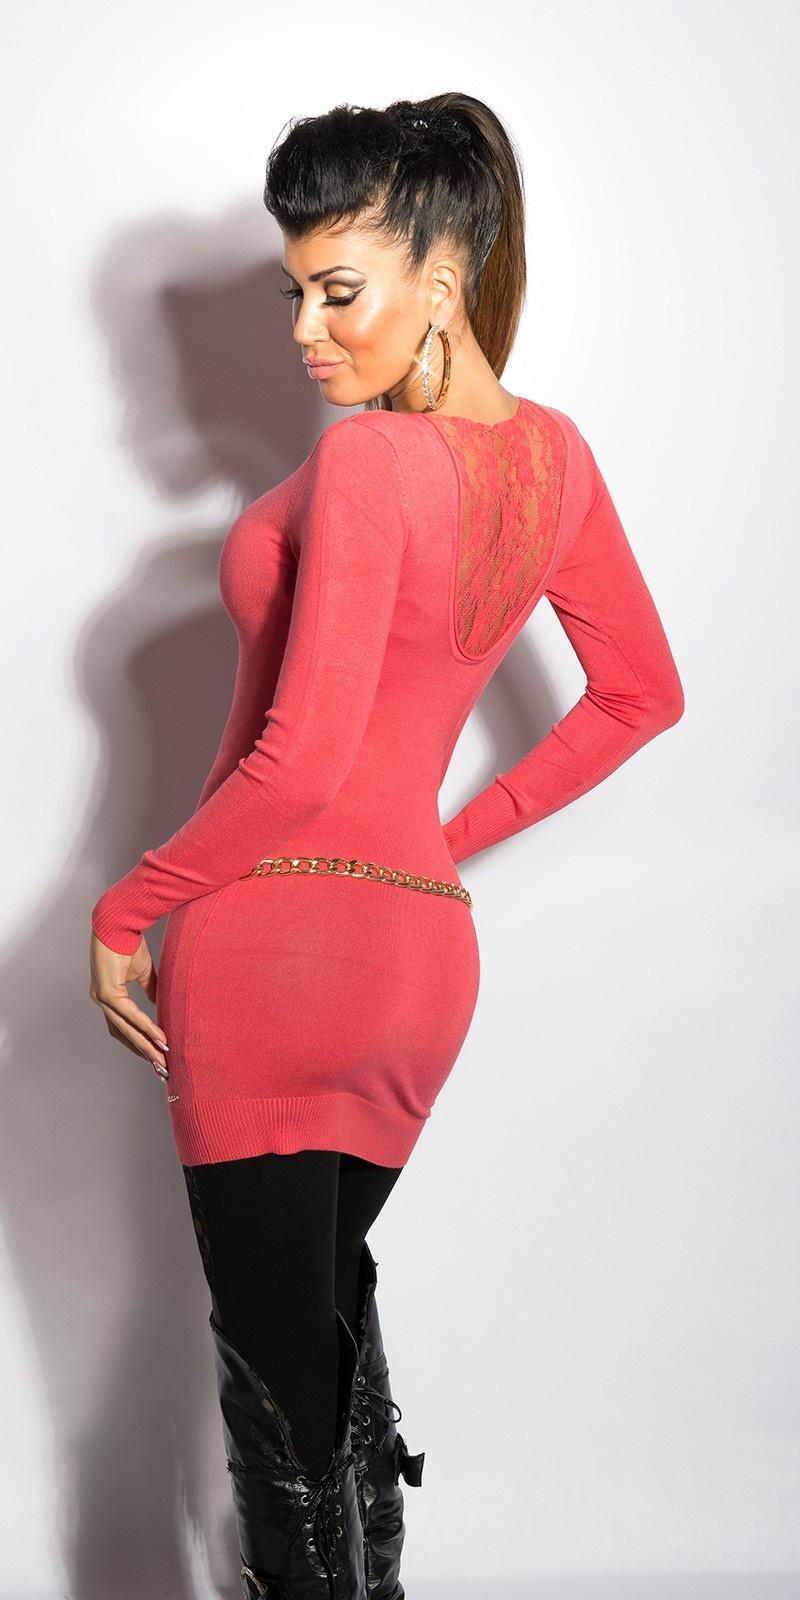 Sexy v-hals-sweater-trui met kant koraal-kleurig